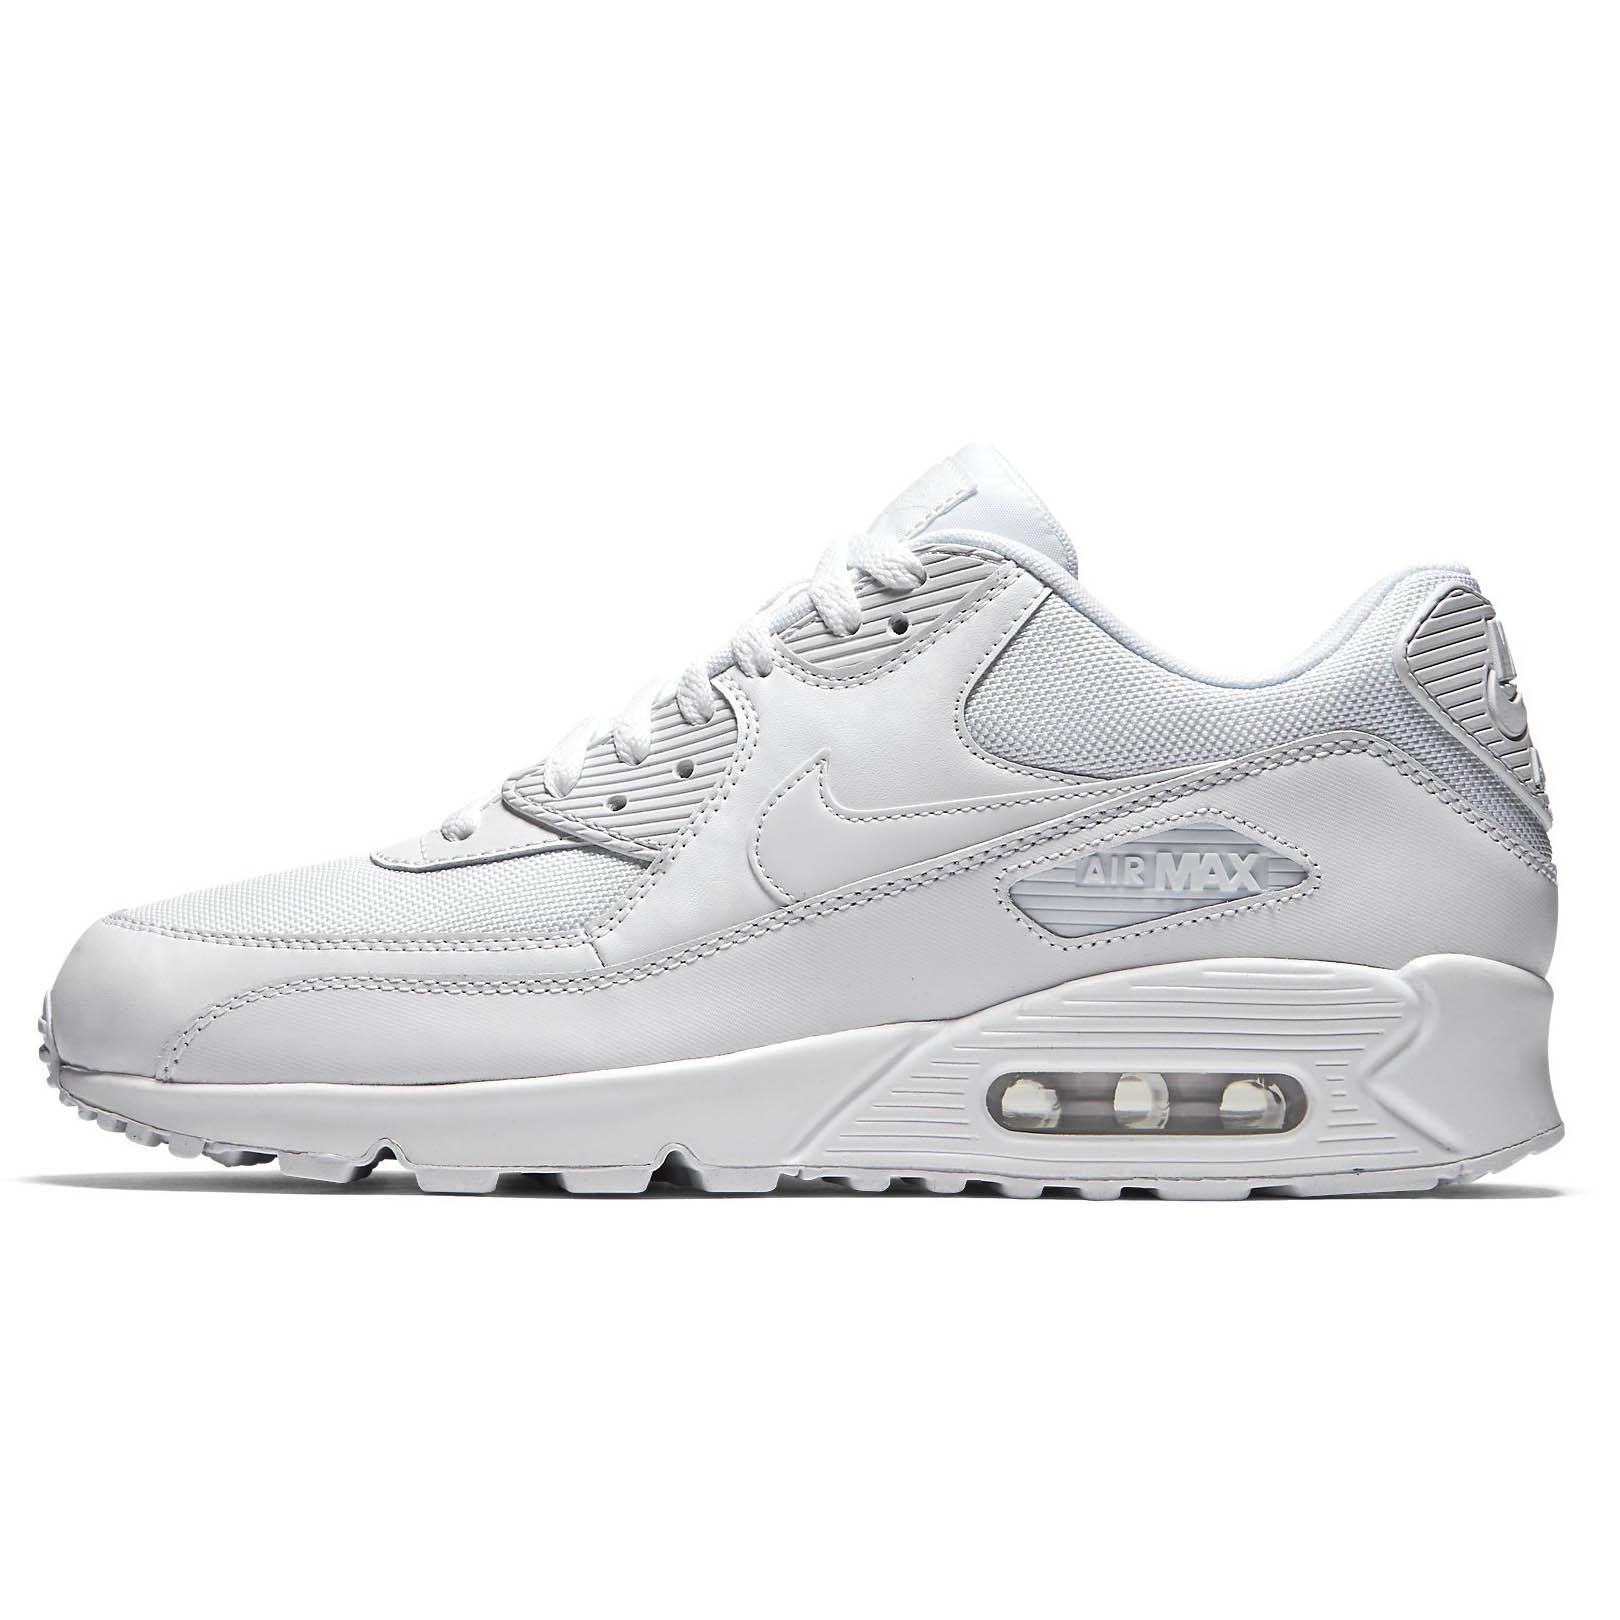 Nike air max 90 Essential pelle tessuto bianco 537384 111